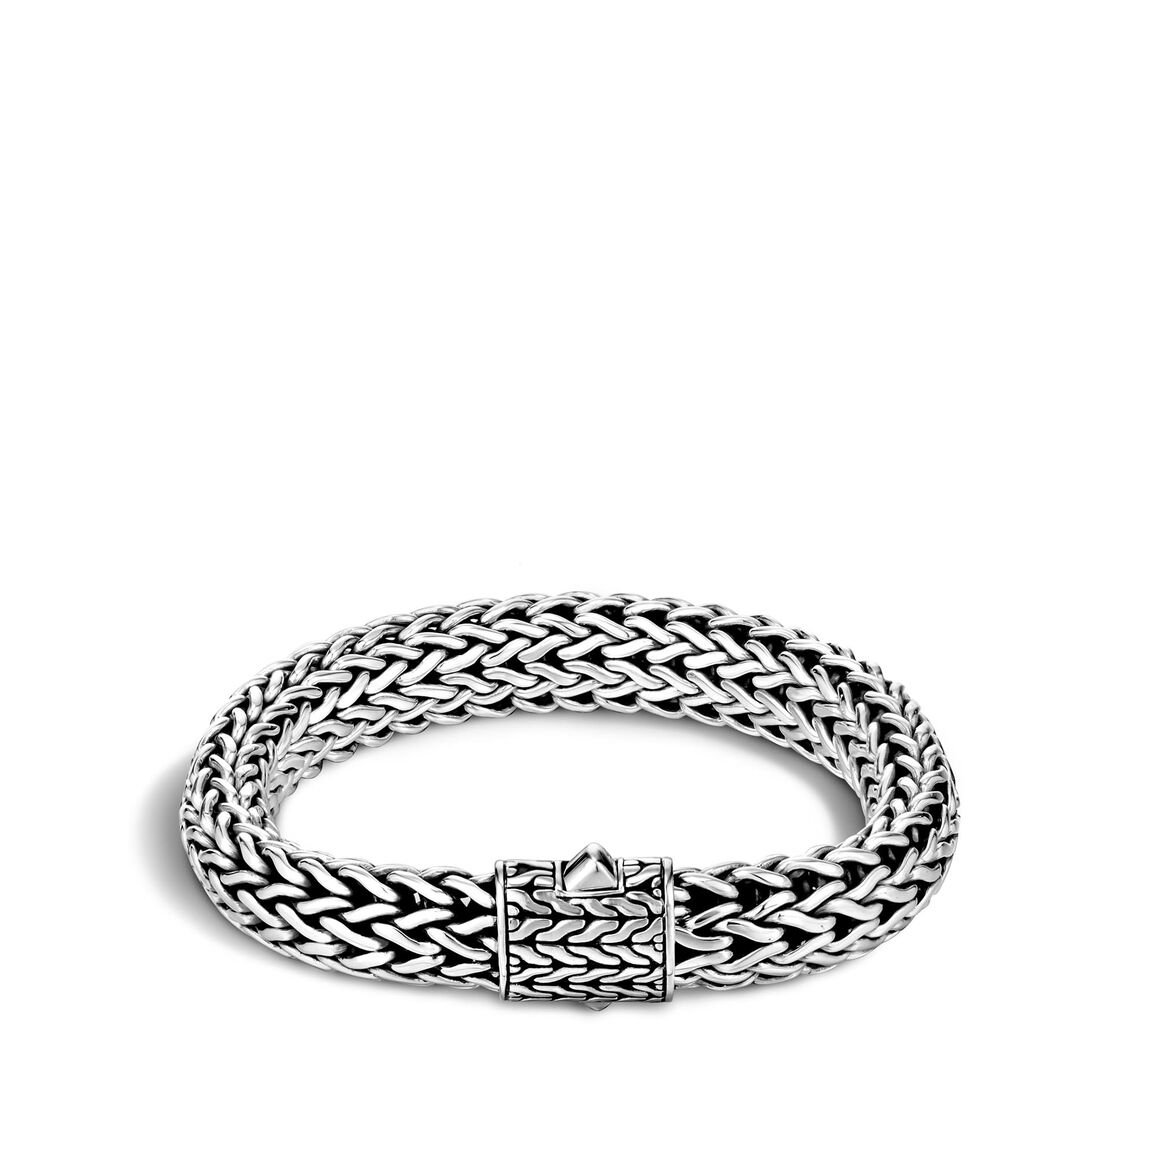 Classic Chain 10.5MM Bracelet in Silver